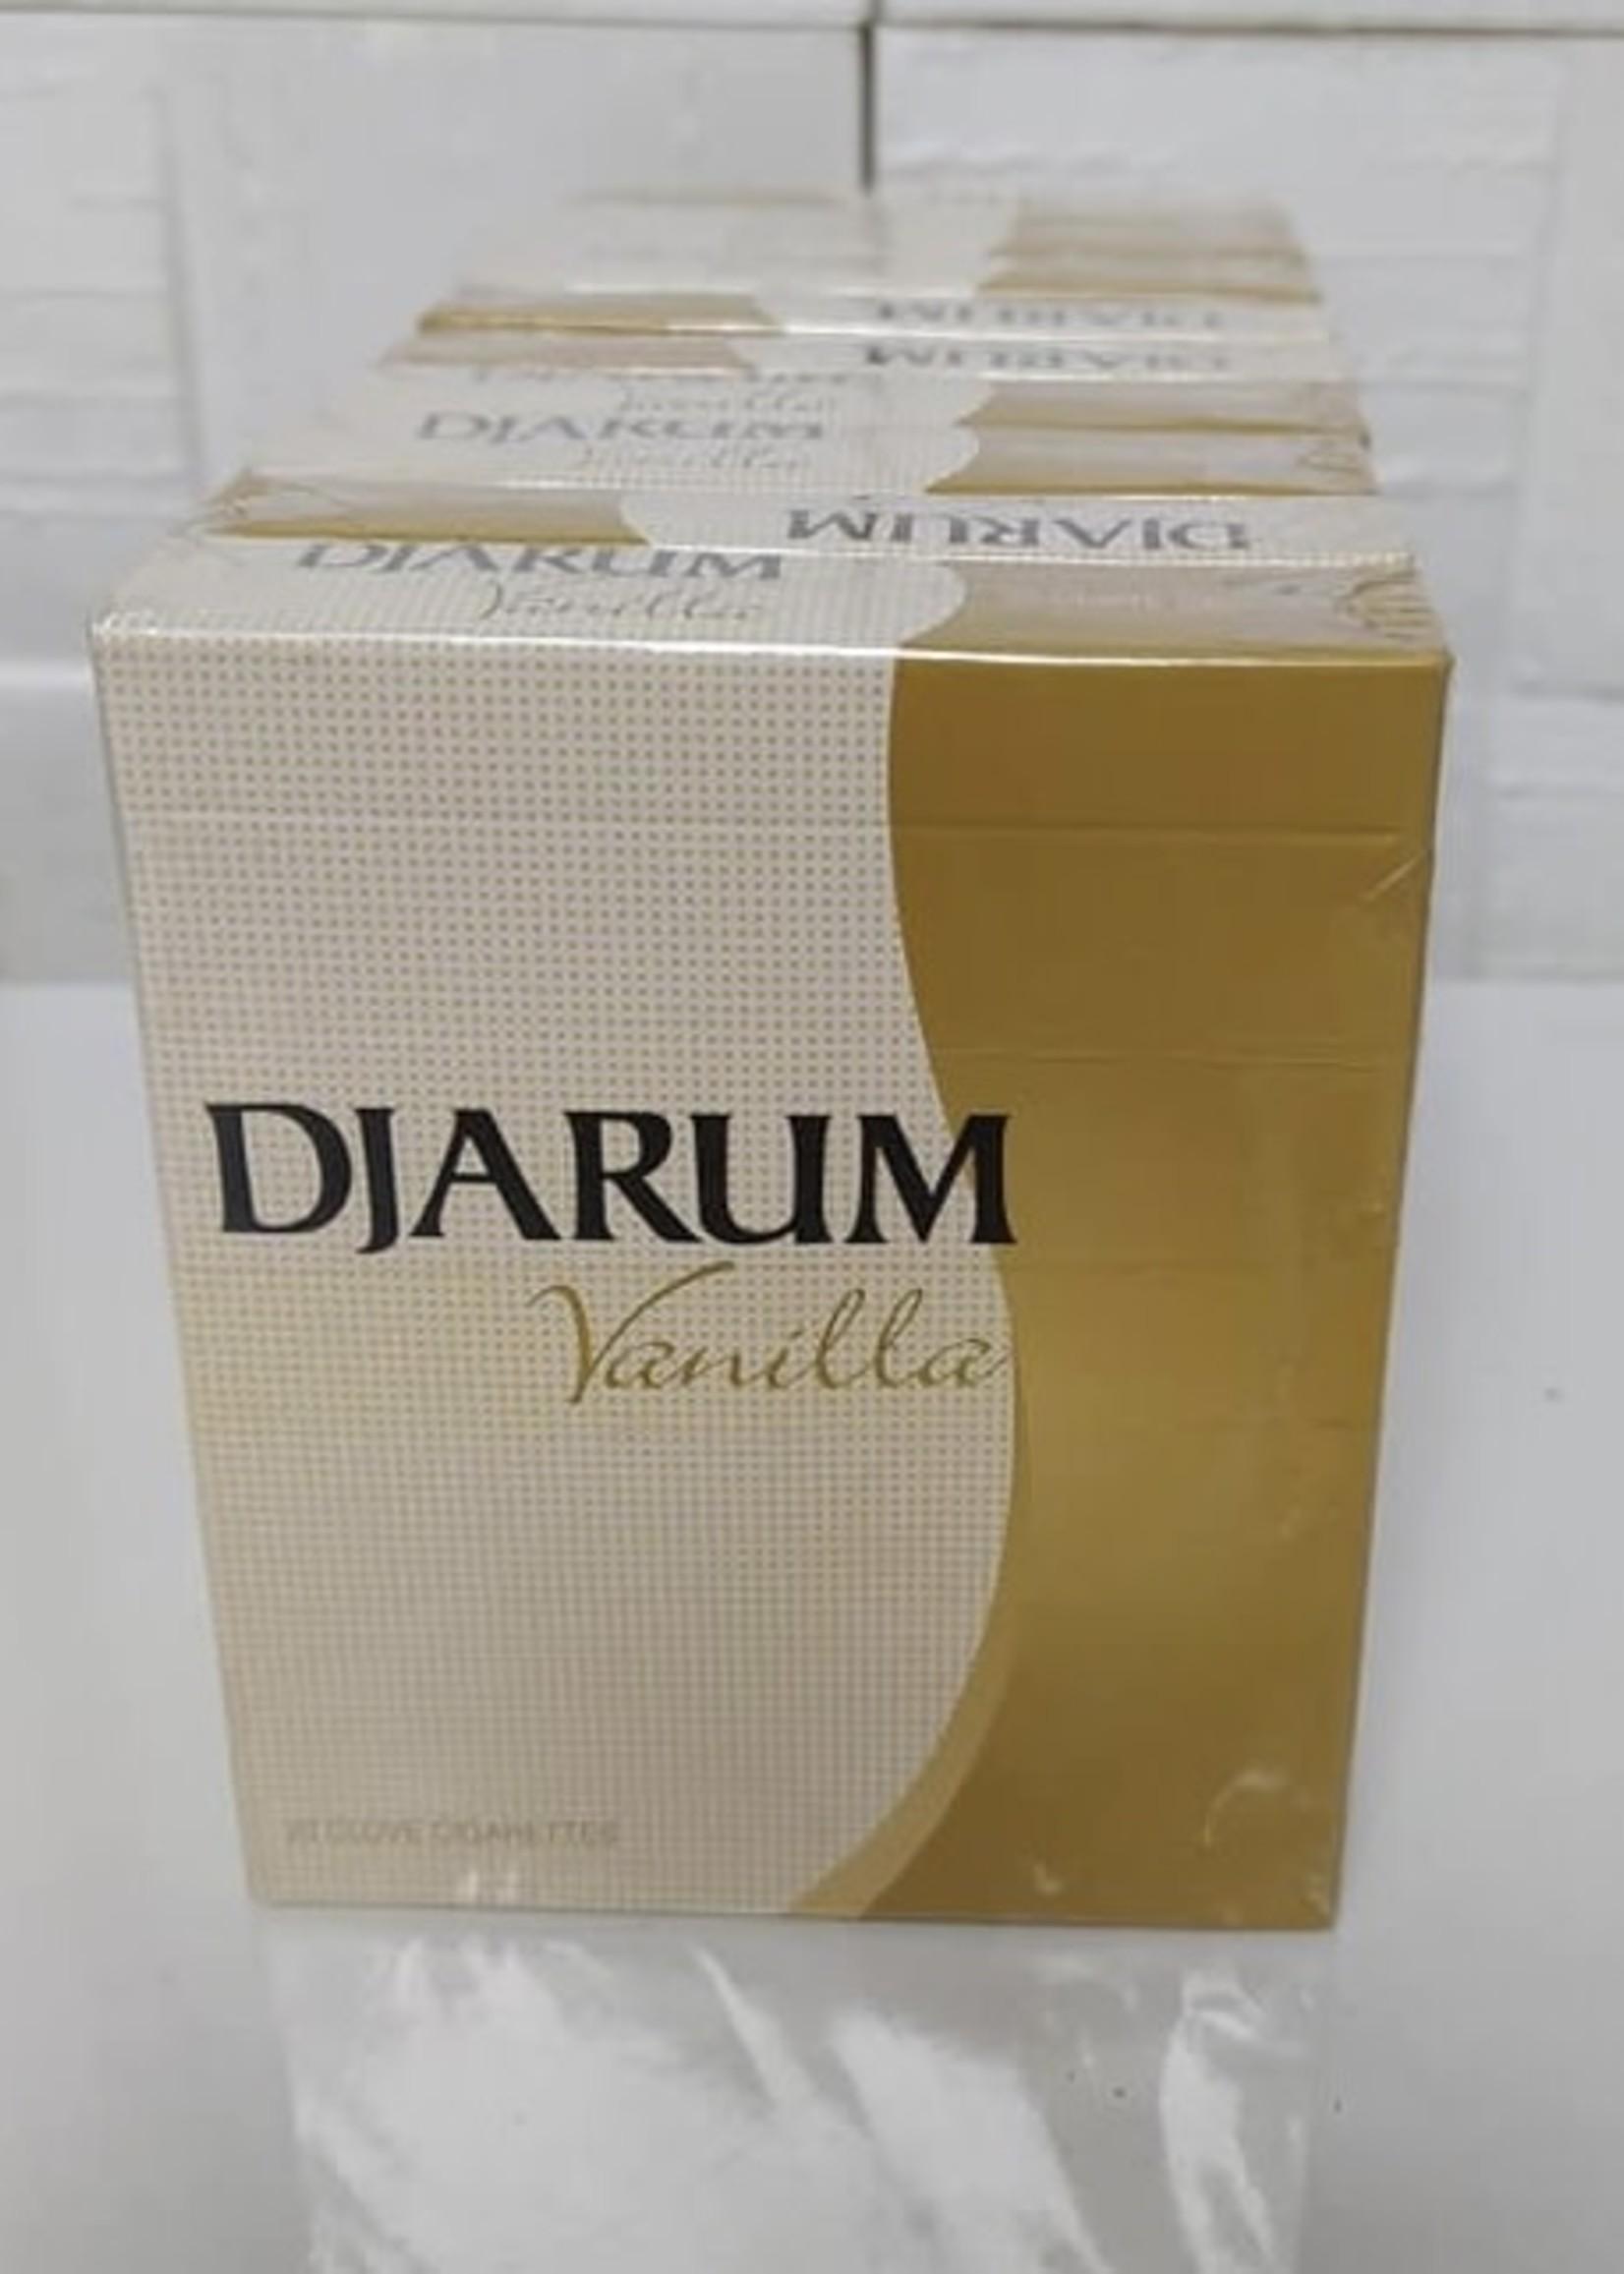 Djarum clove cigarettes - vanilla